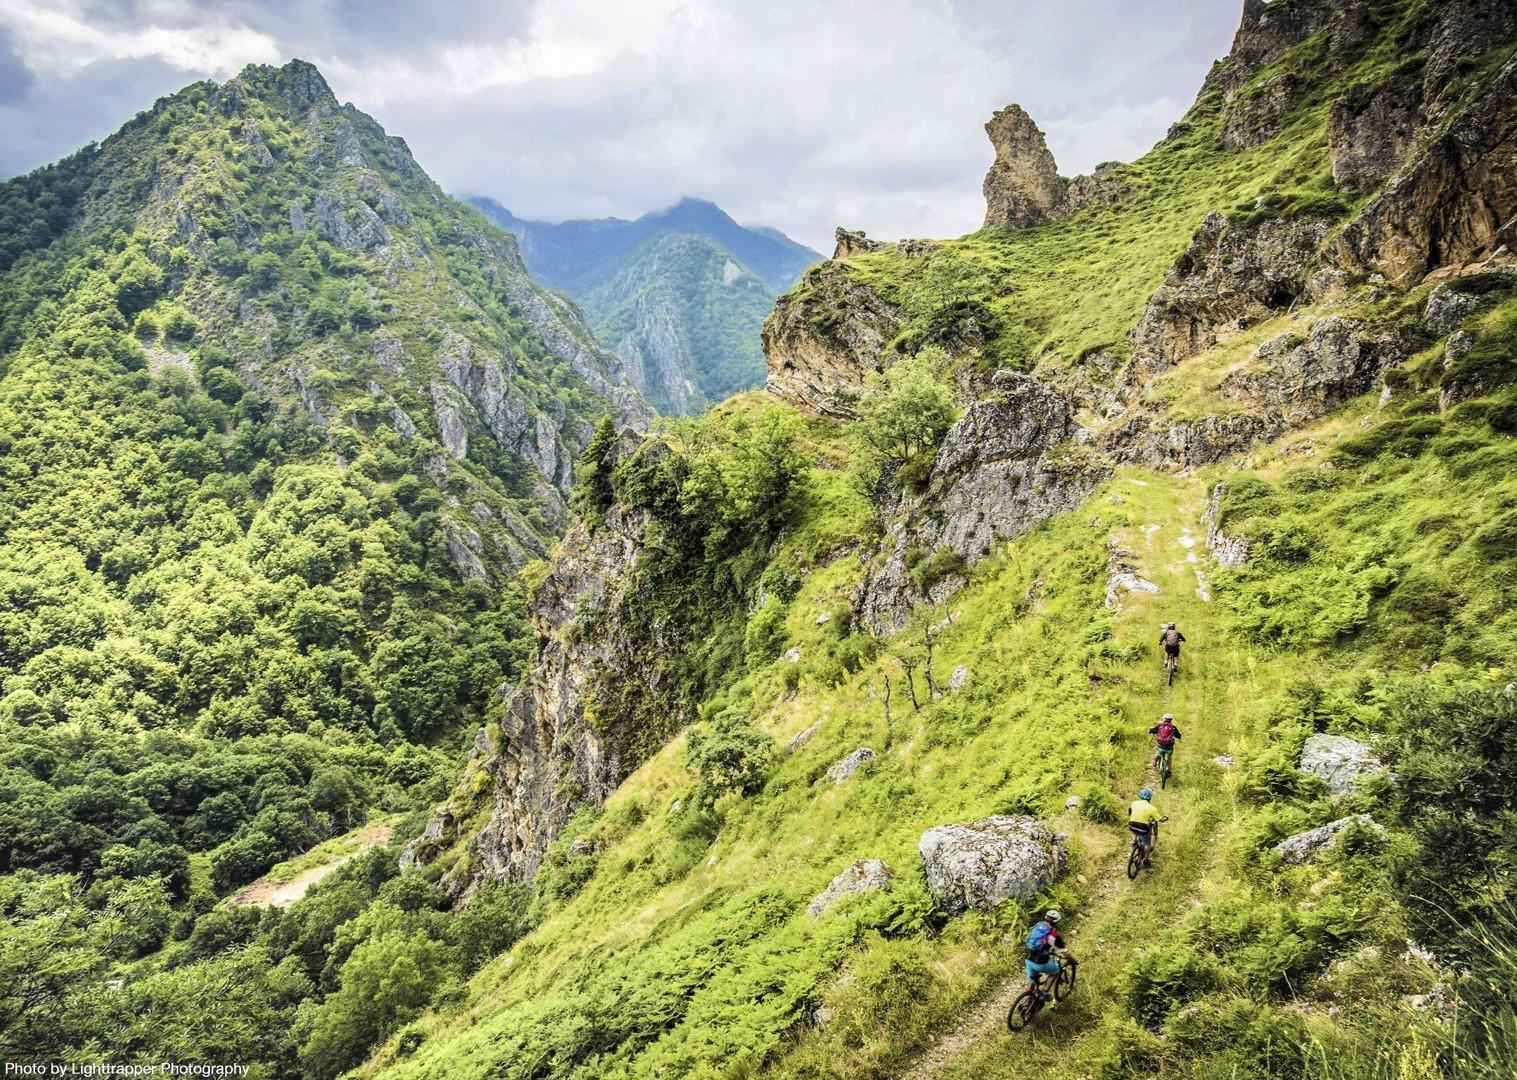 _Holiday.60.23118-2.jpg - Spain - Picos de Europa - Trans Picos - Guided Mountain Bike Holiday - Mountain Biking